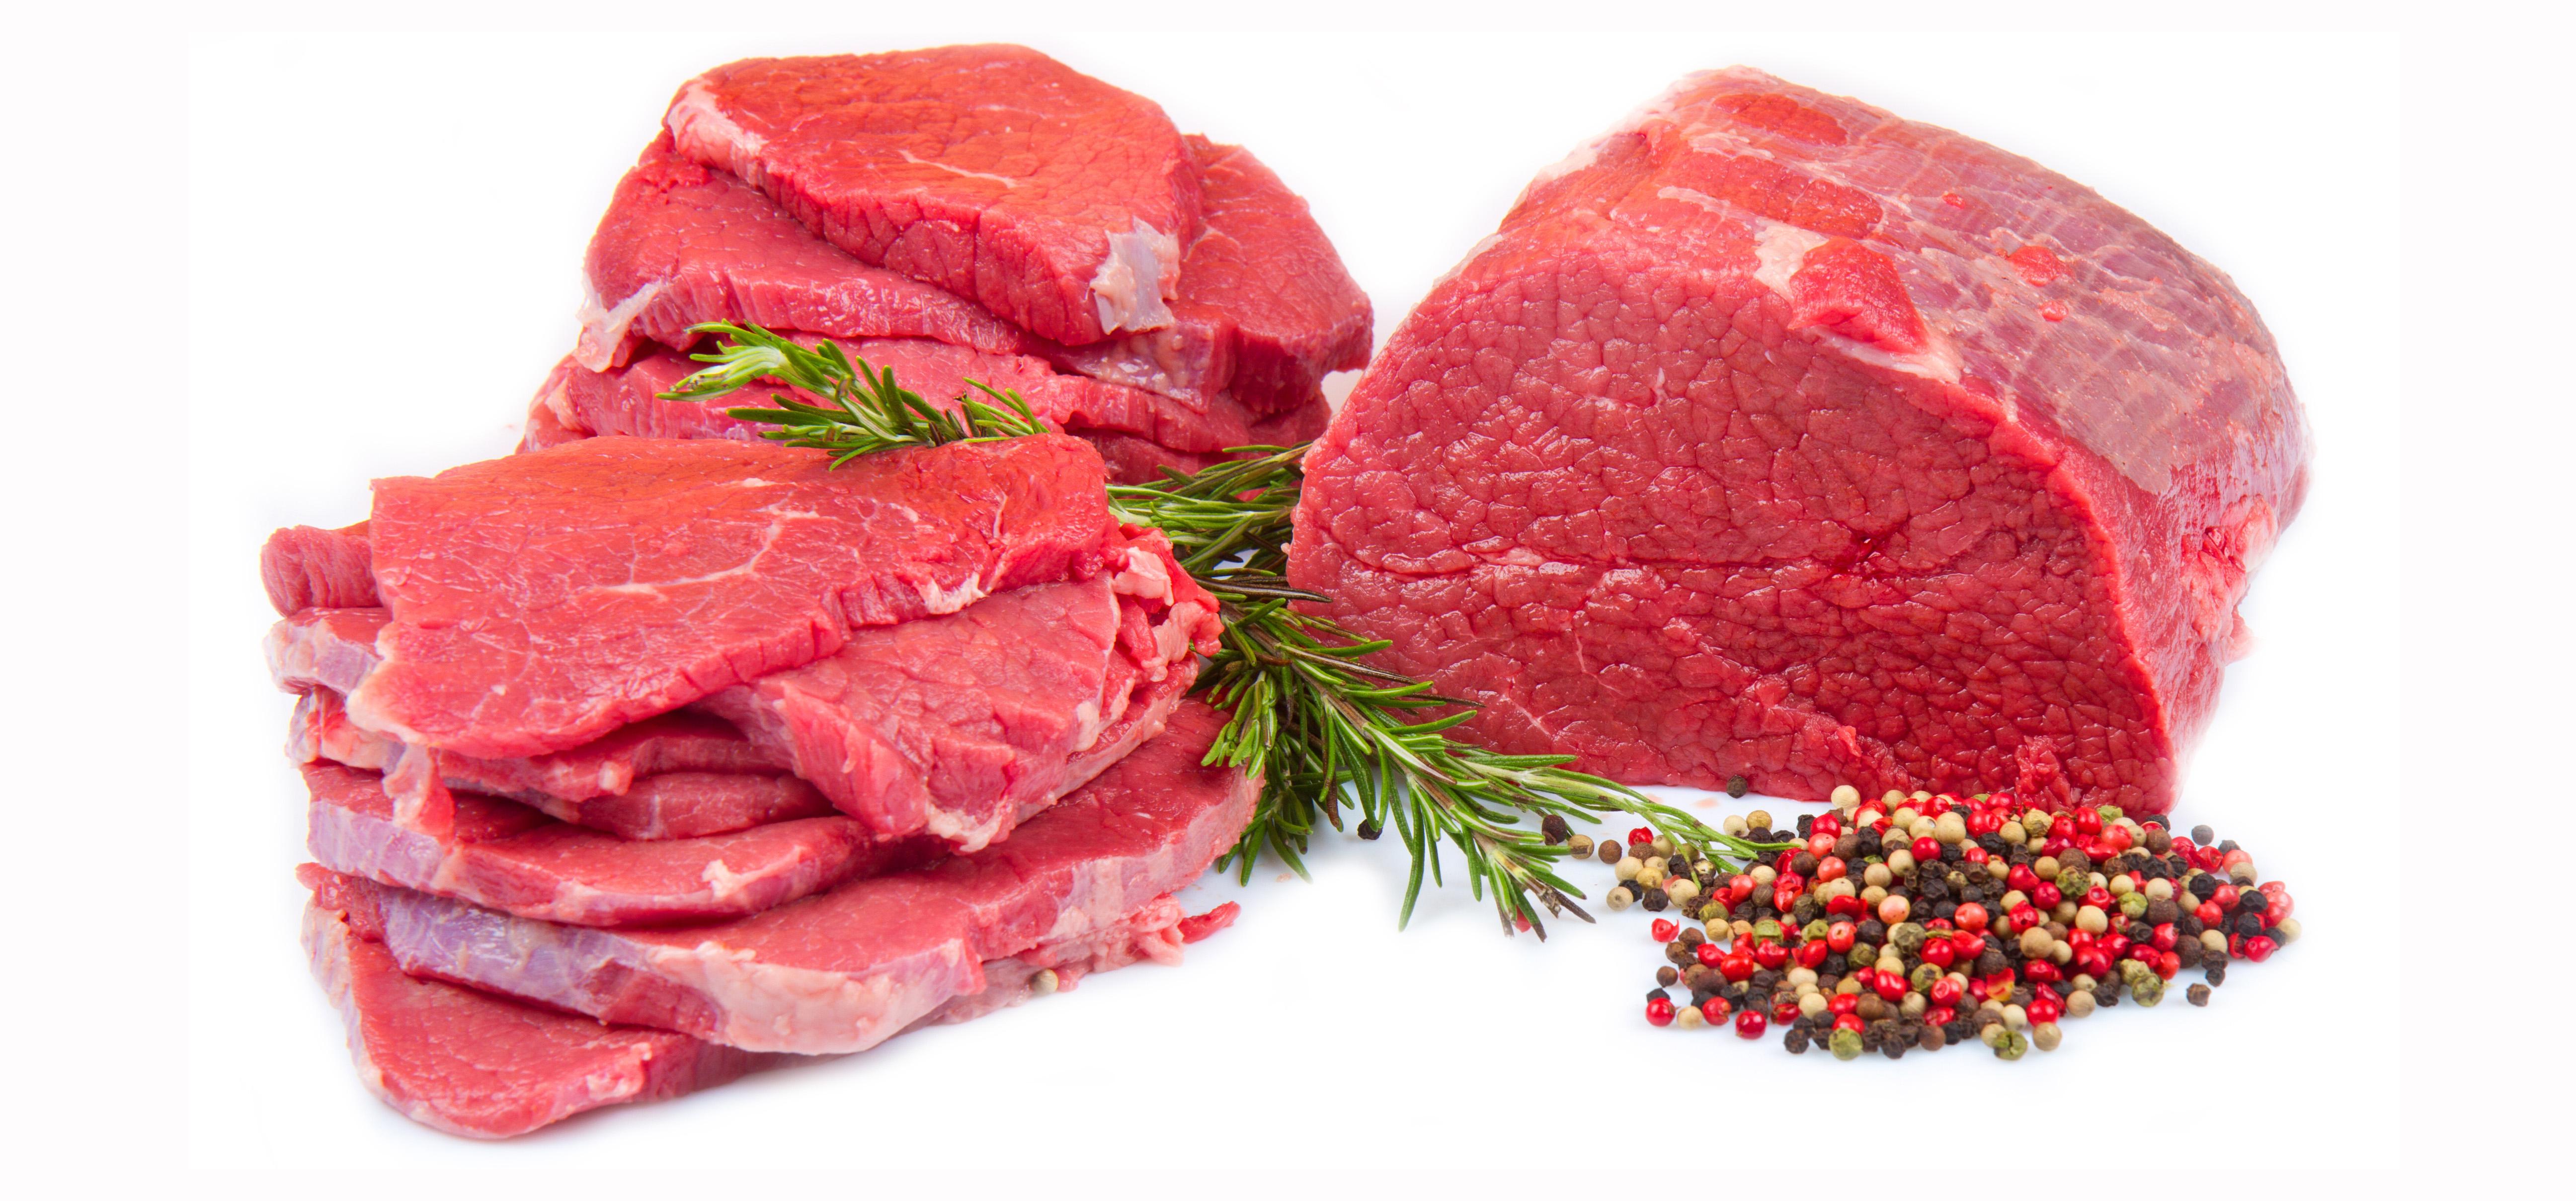 carne-dieta-gay-passivo-sexo-anal